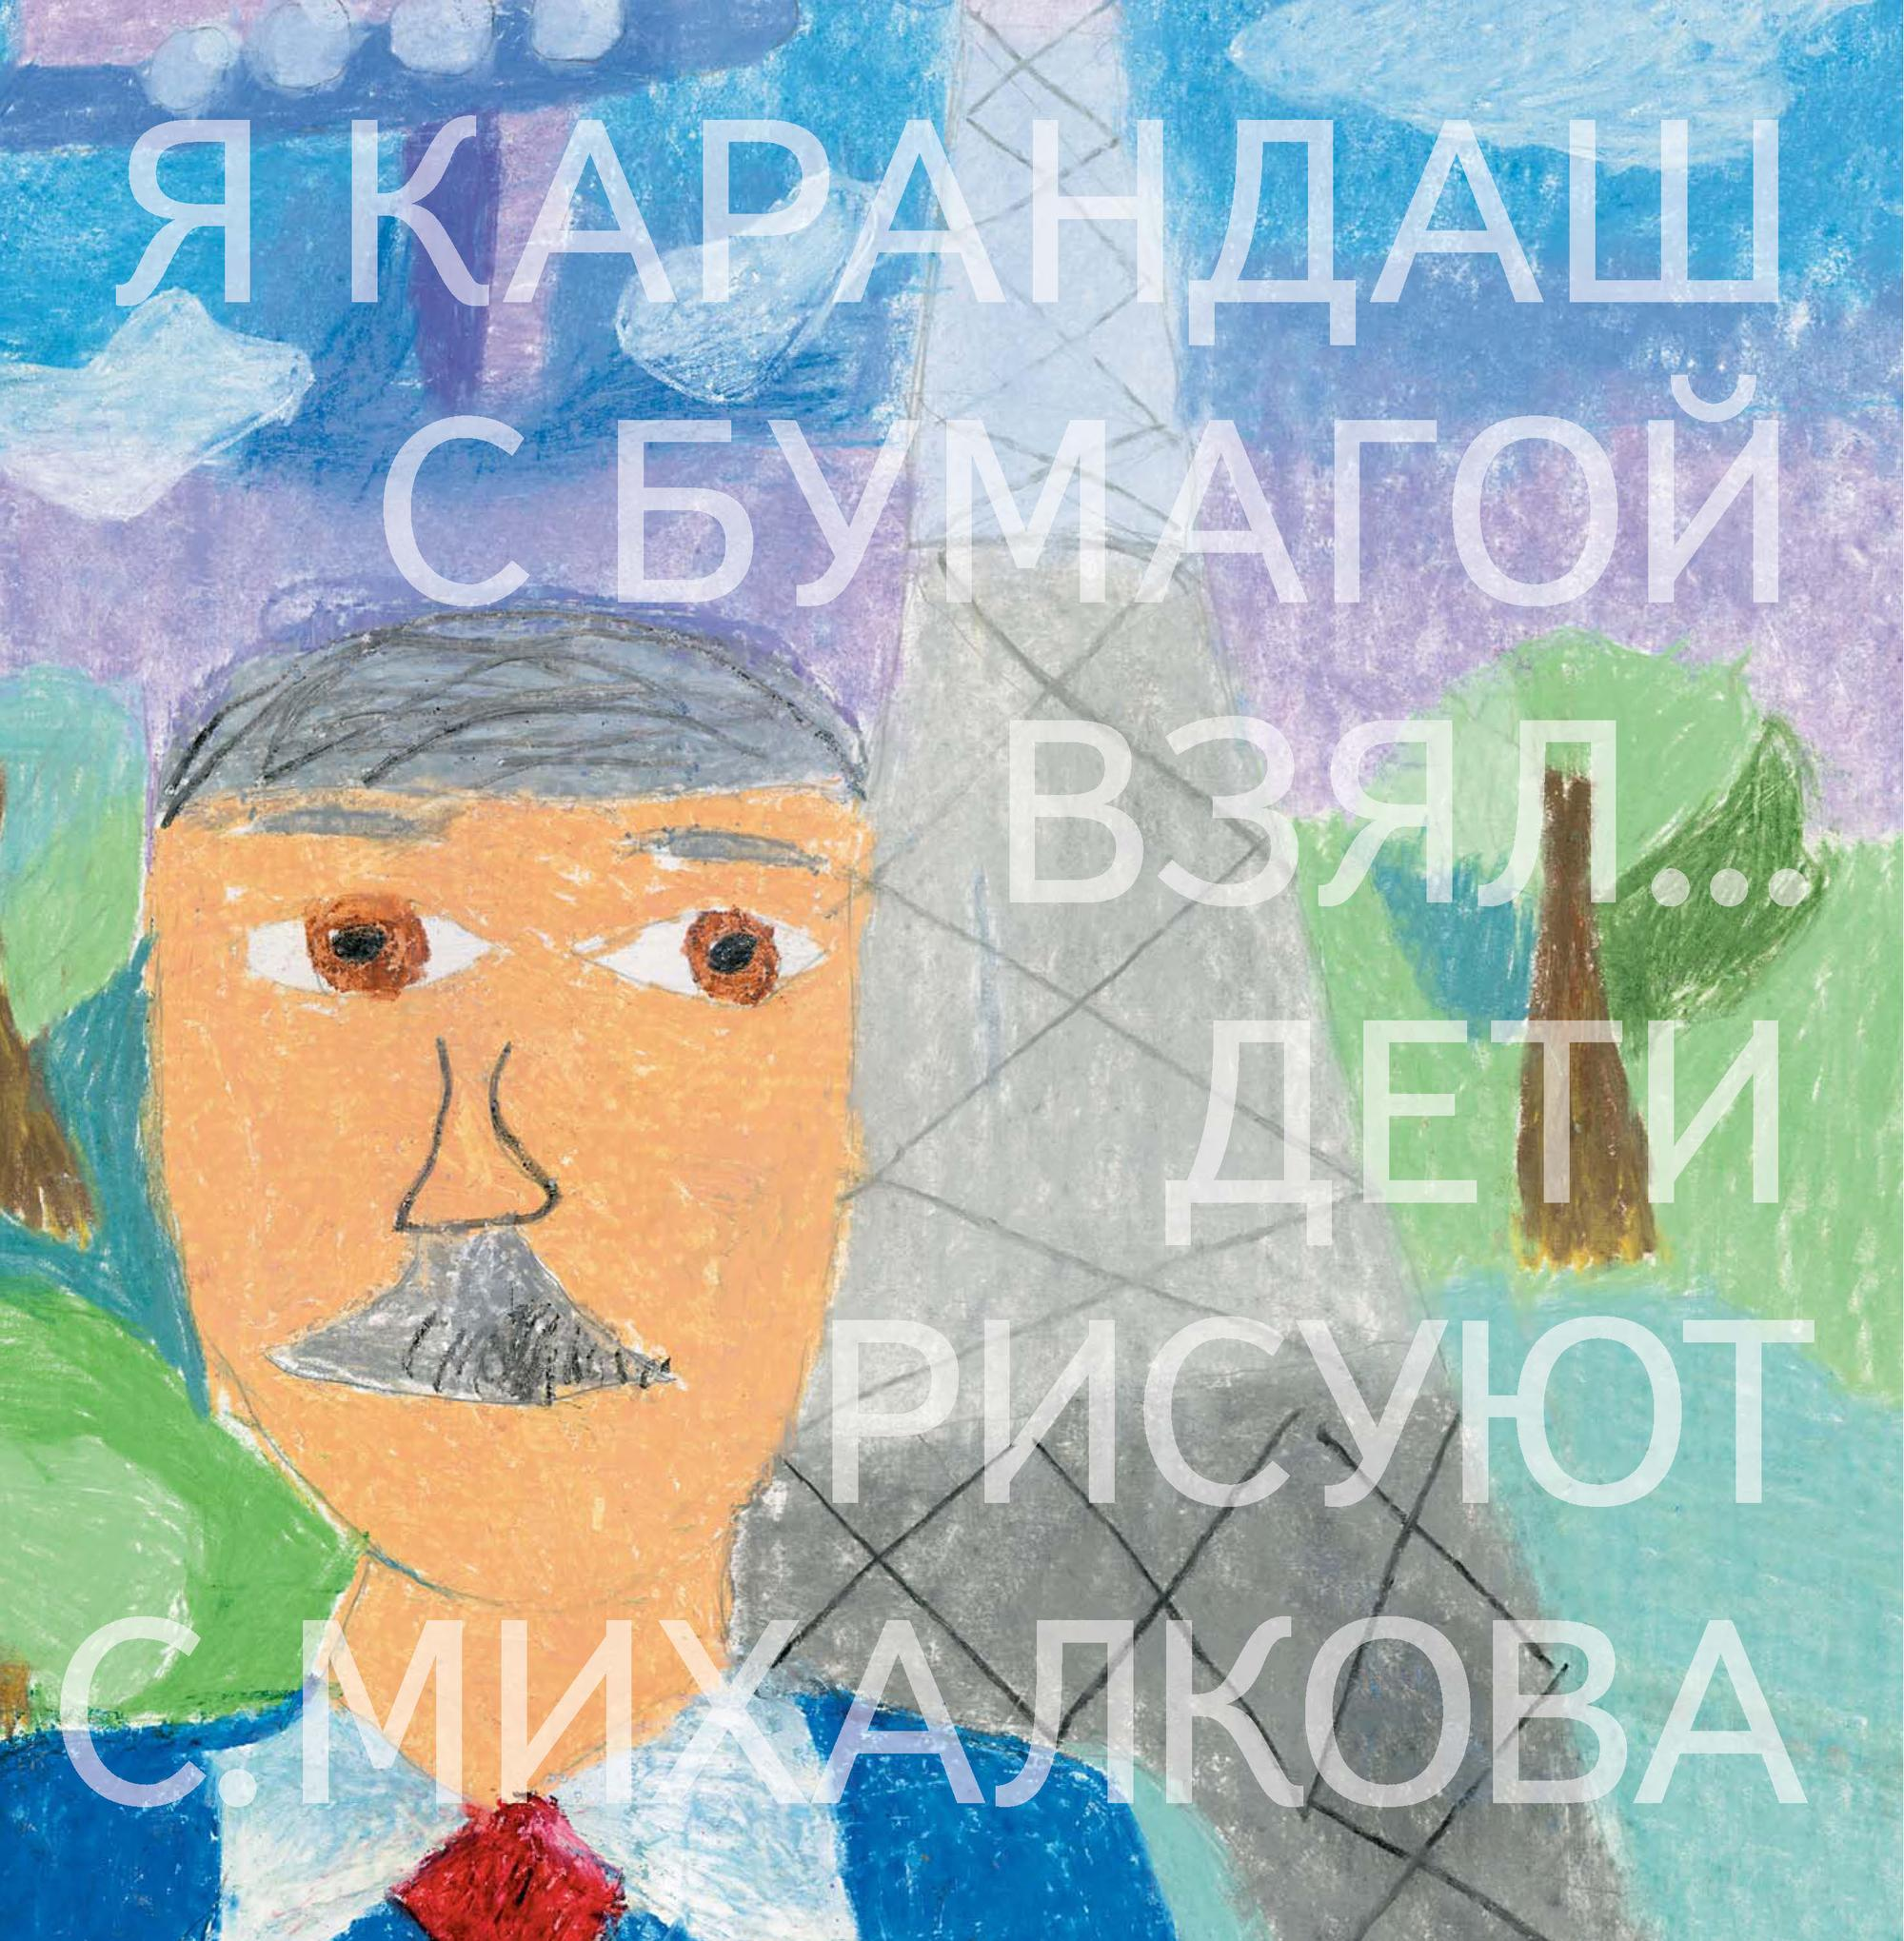 Сергей Михалков Я карандаш с бумагой взял… Дети рисуют С. Михалкова цена